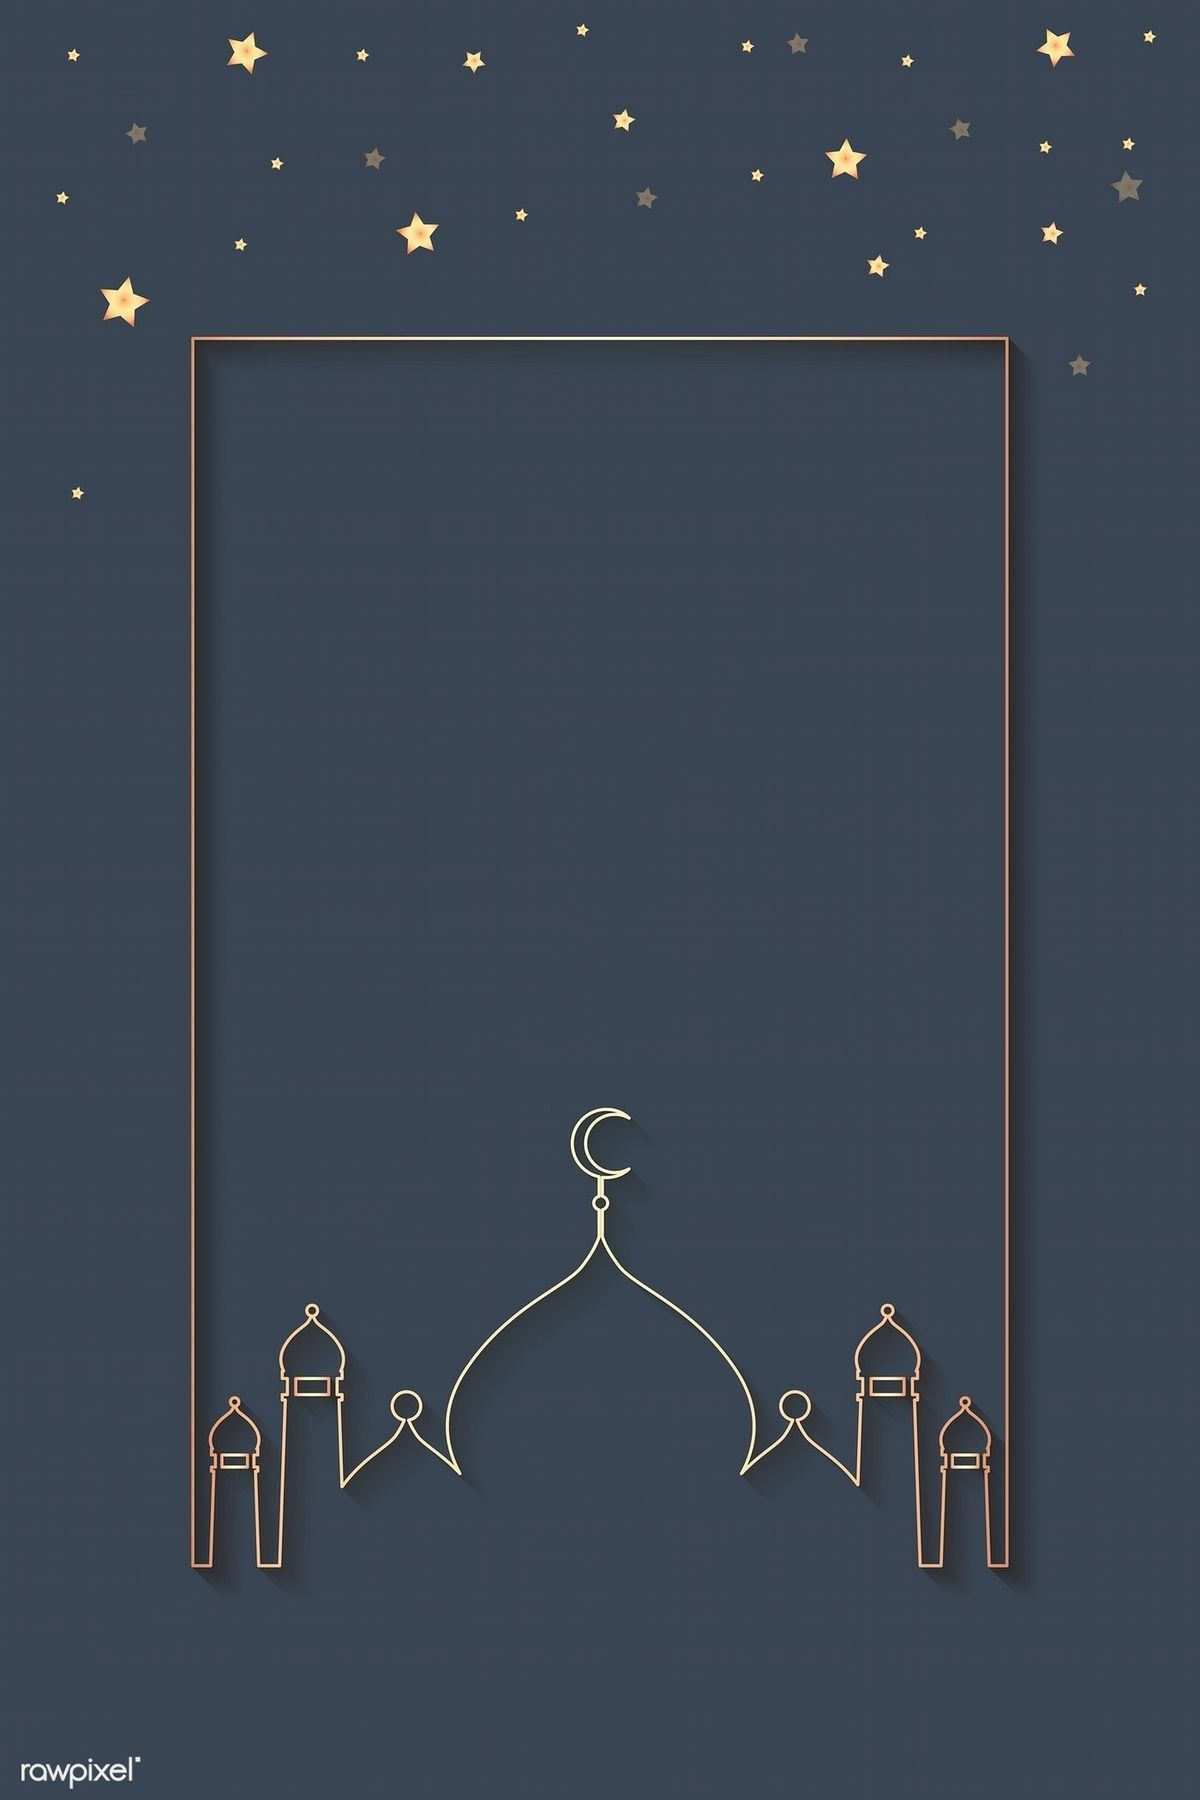 Background Pamflet Ramadhan : background, pamflet, ramadhan, Lizamac, Mubarak, Wallpaper, Islami,, Desain, Pamflet,, Geometris